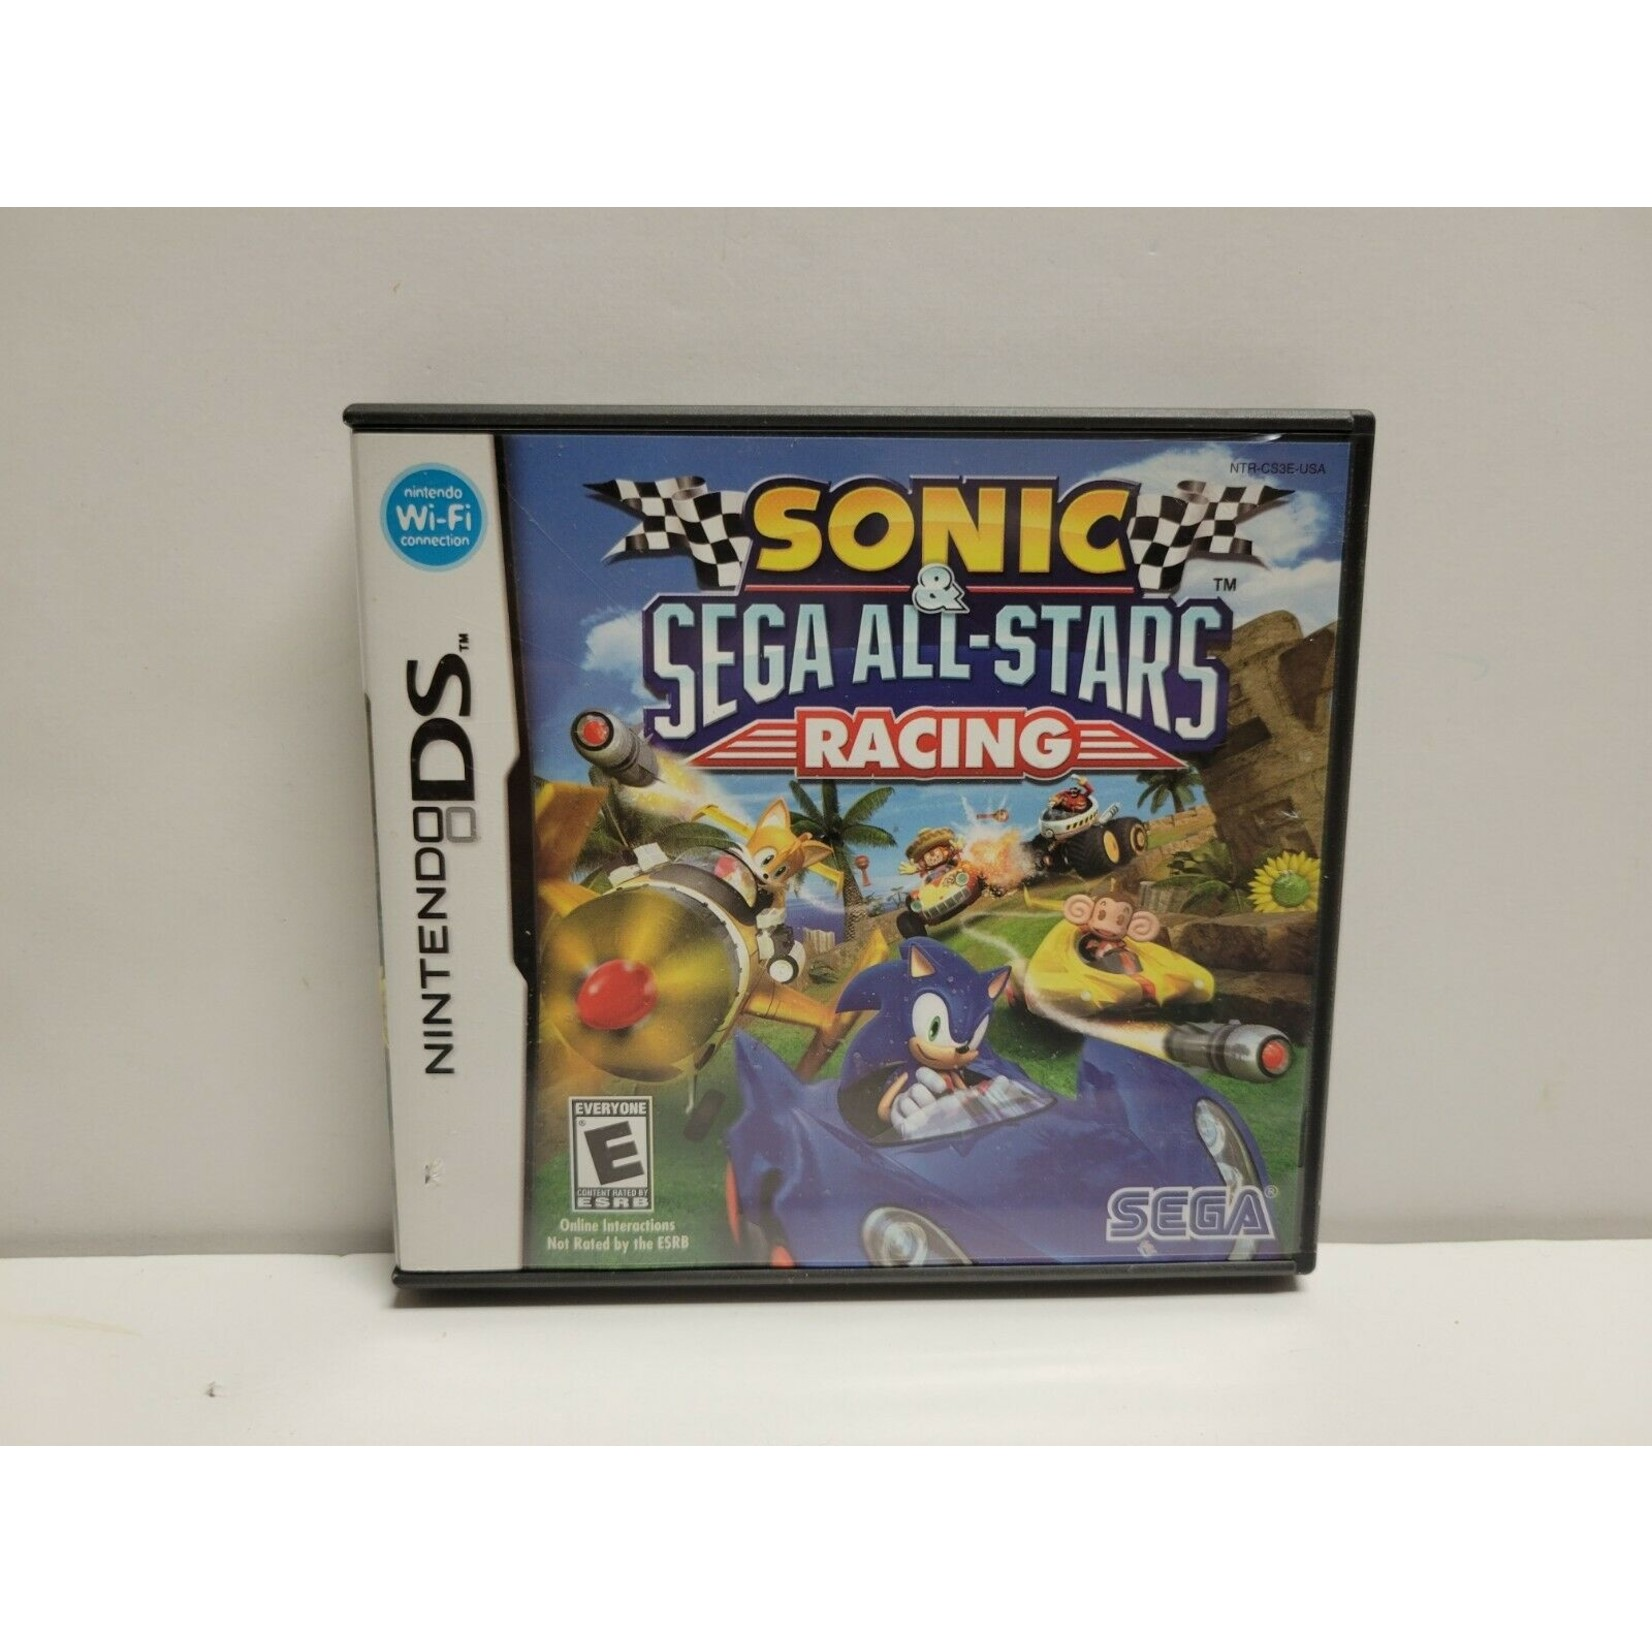 DSU-Sonic & SEGA All-Stars Racing